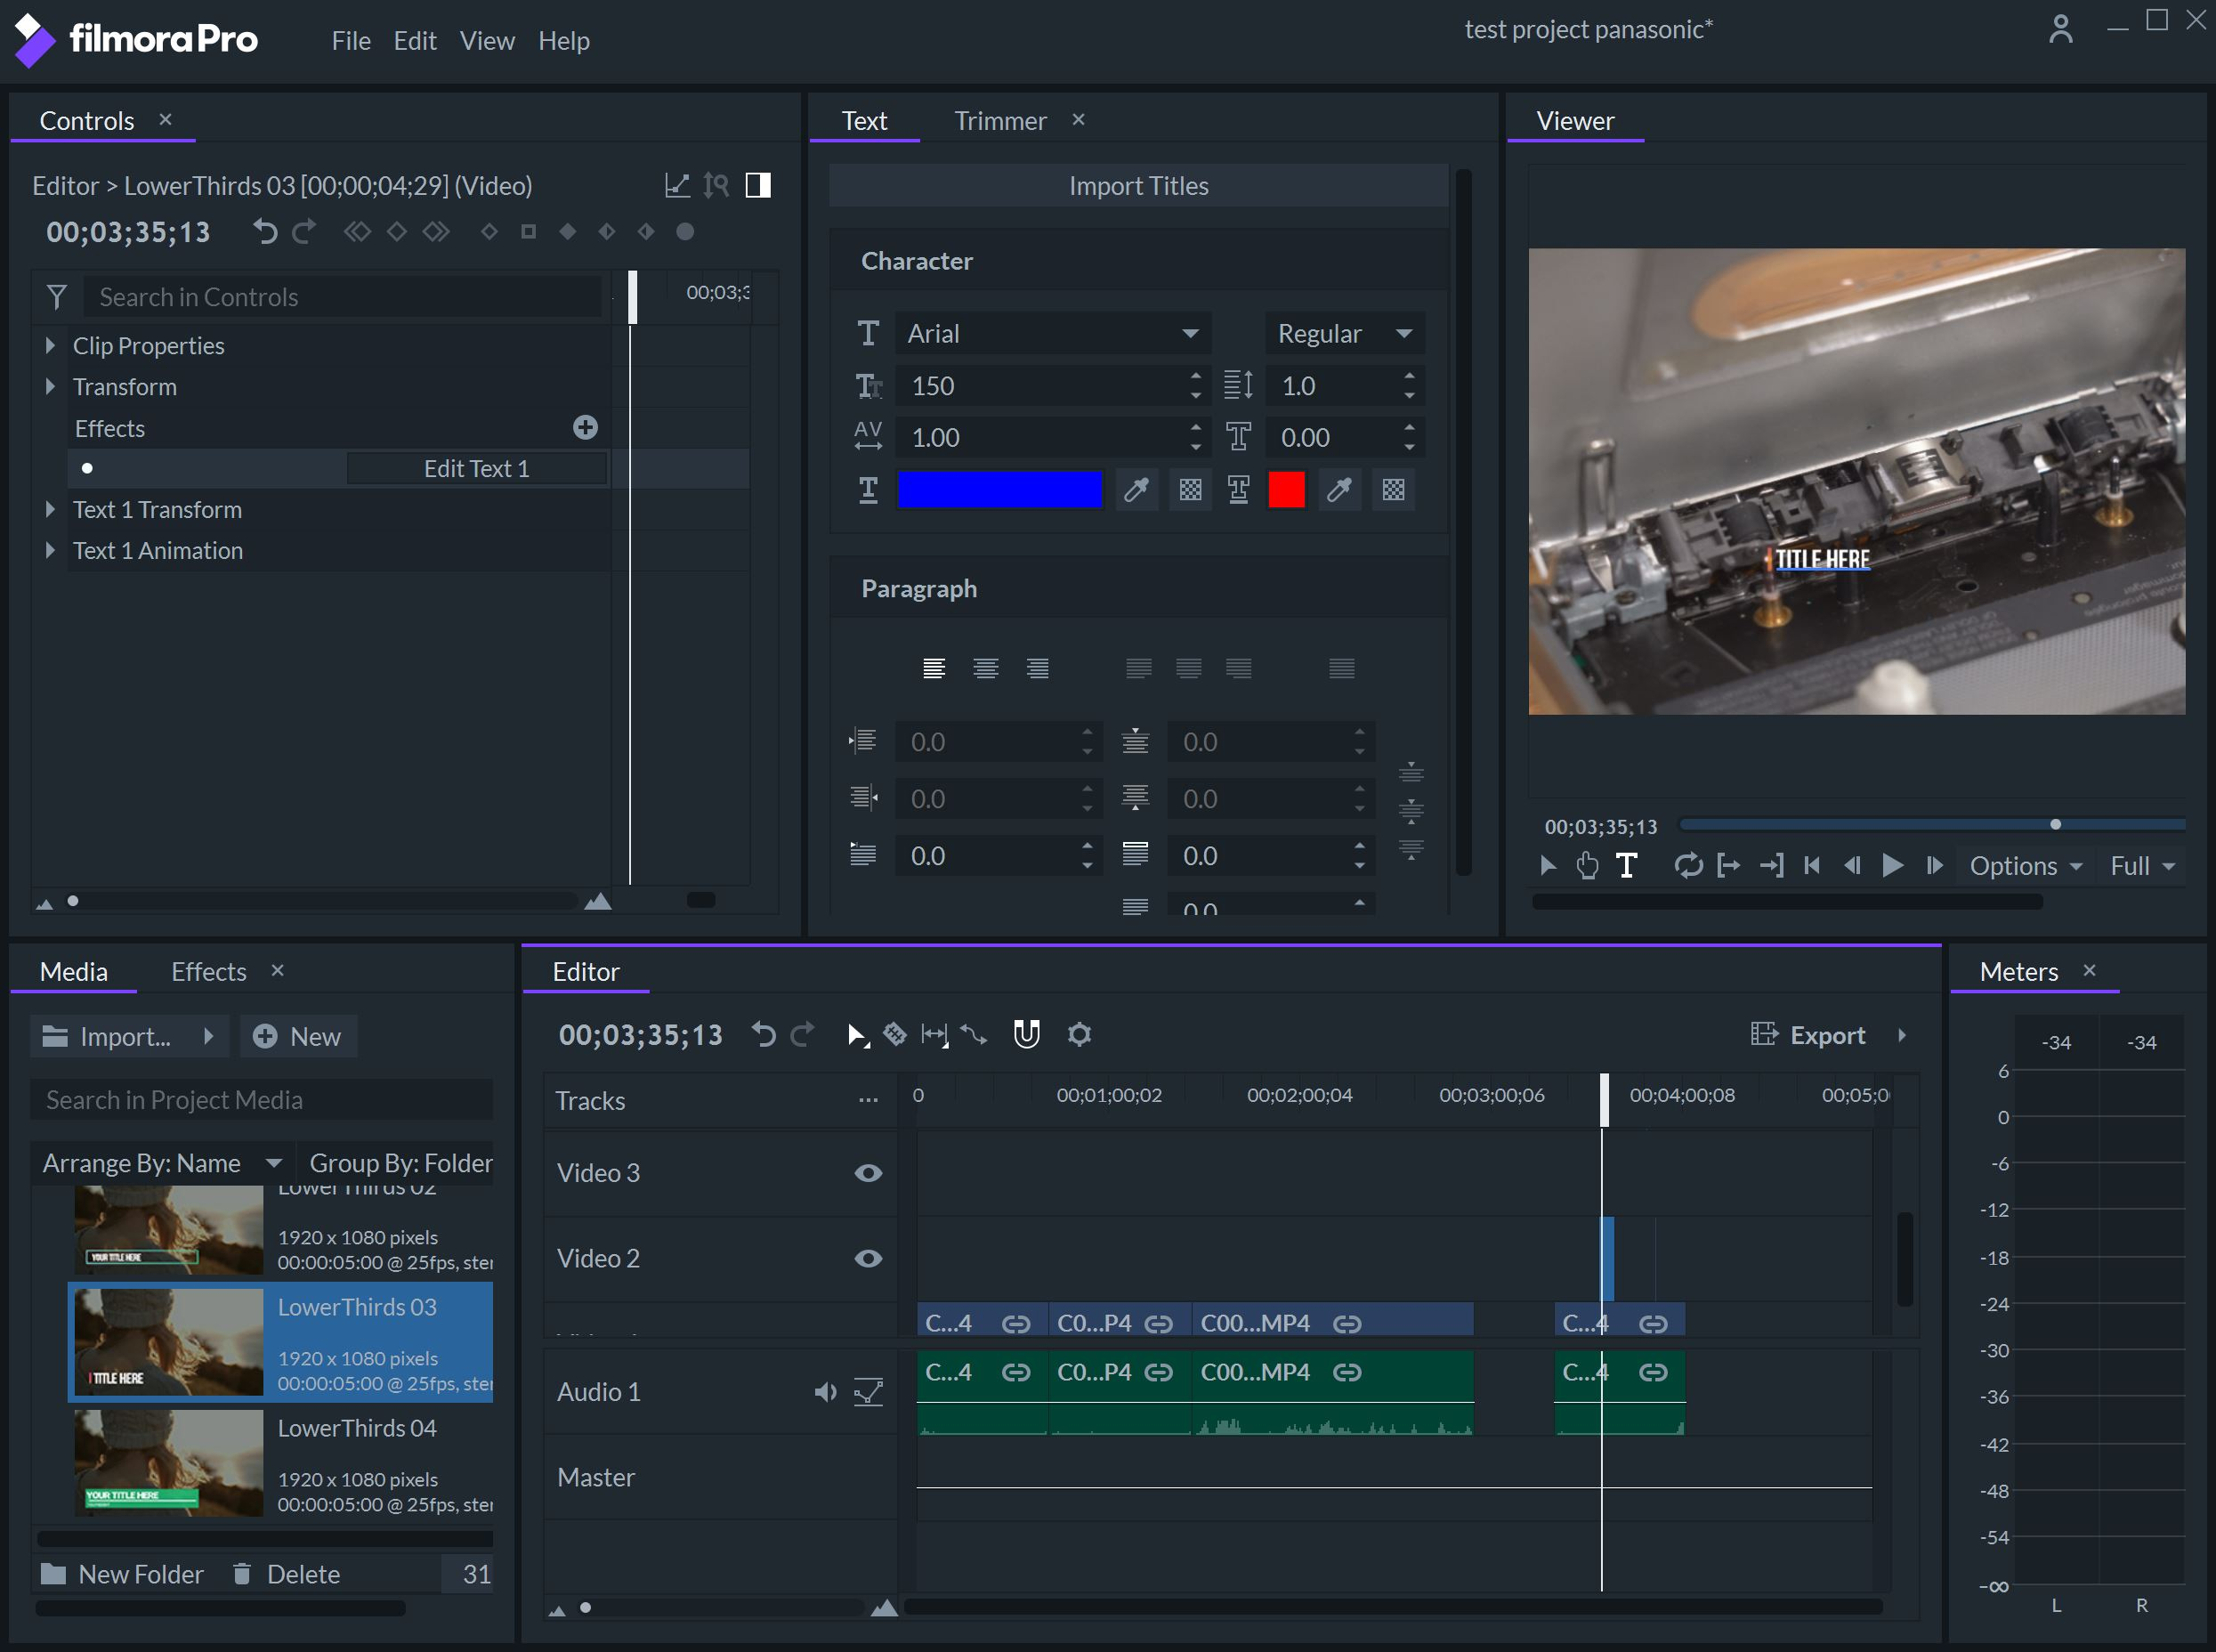 Review: Wondershare FilmoraPro video editing software: Digital